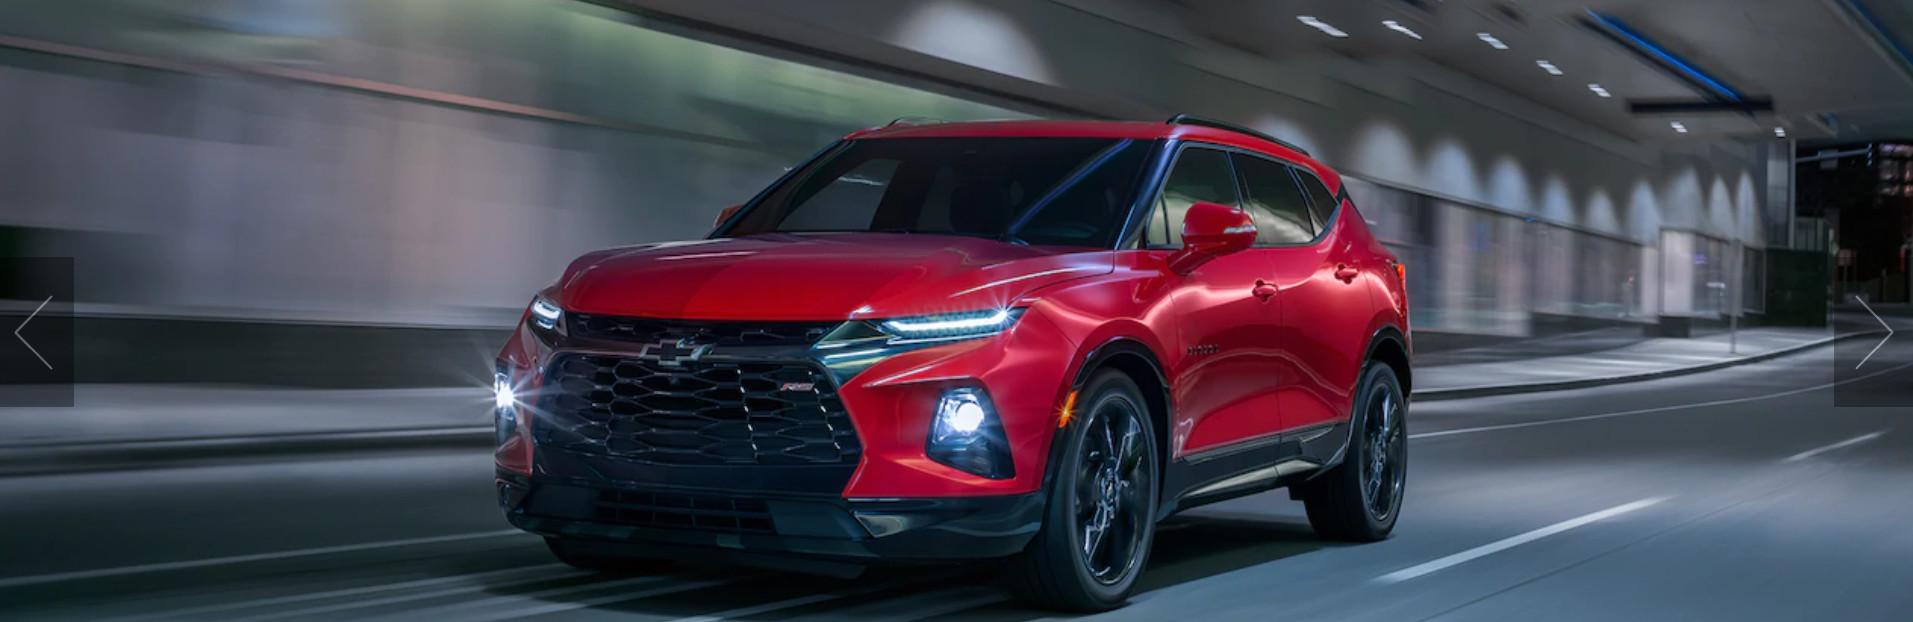 Chevrolet Blazer 2019 a la venta cerca de Fairfax, VA